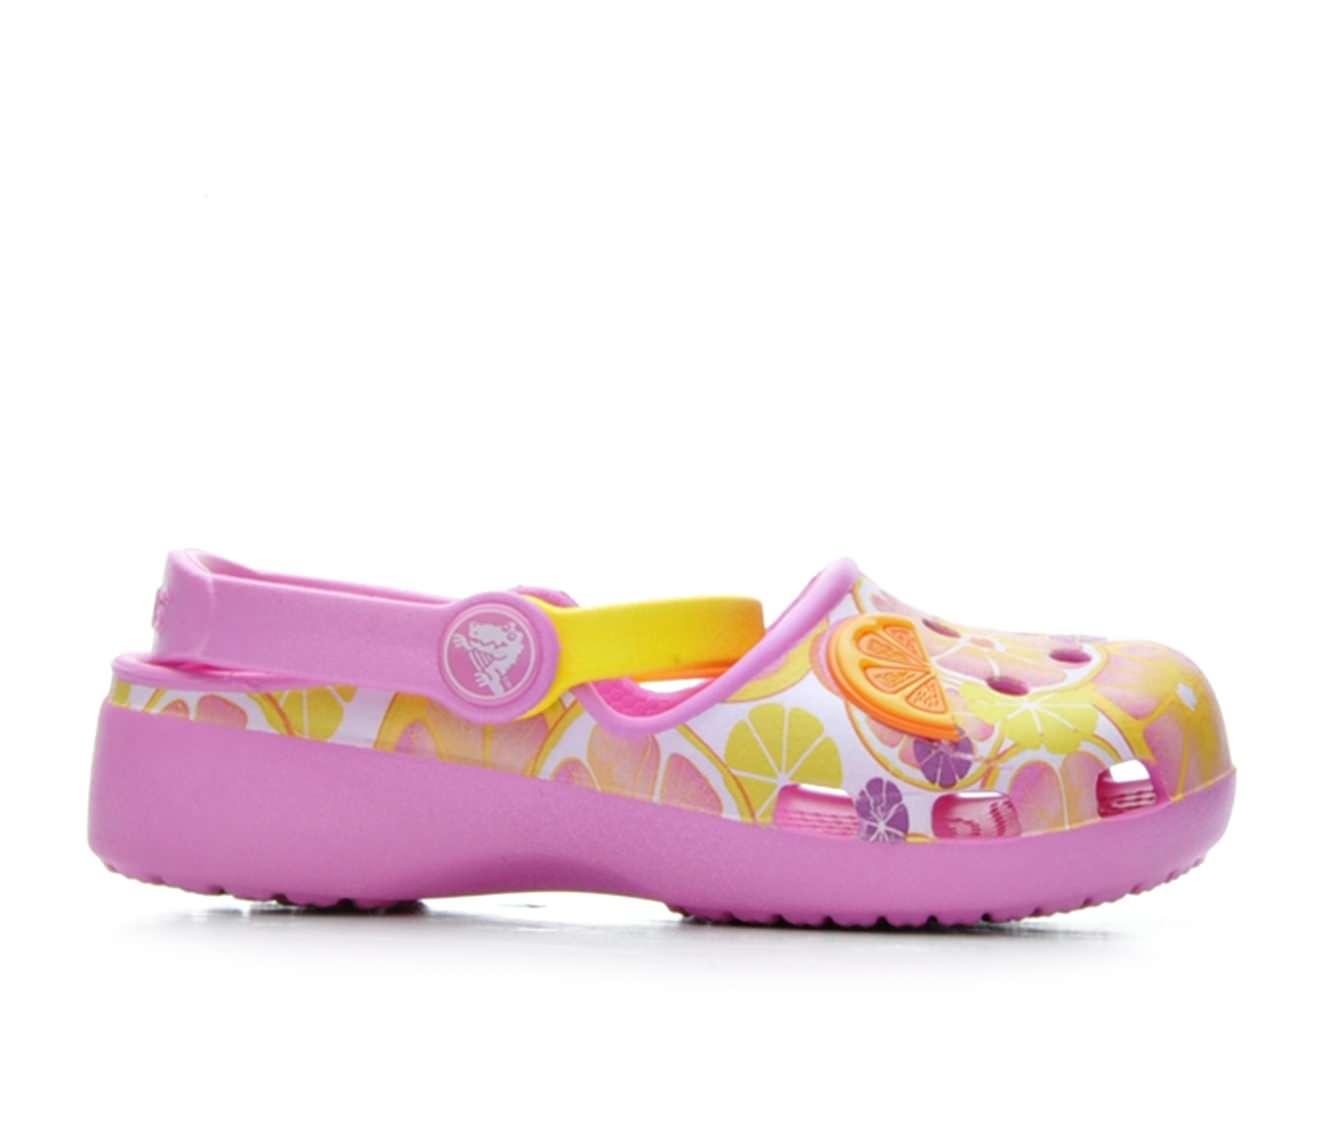 Girls' Crocs Karin Novelty Children's Shoes (Pink)